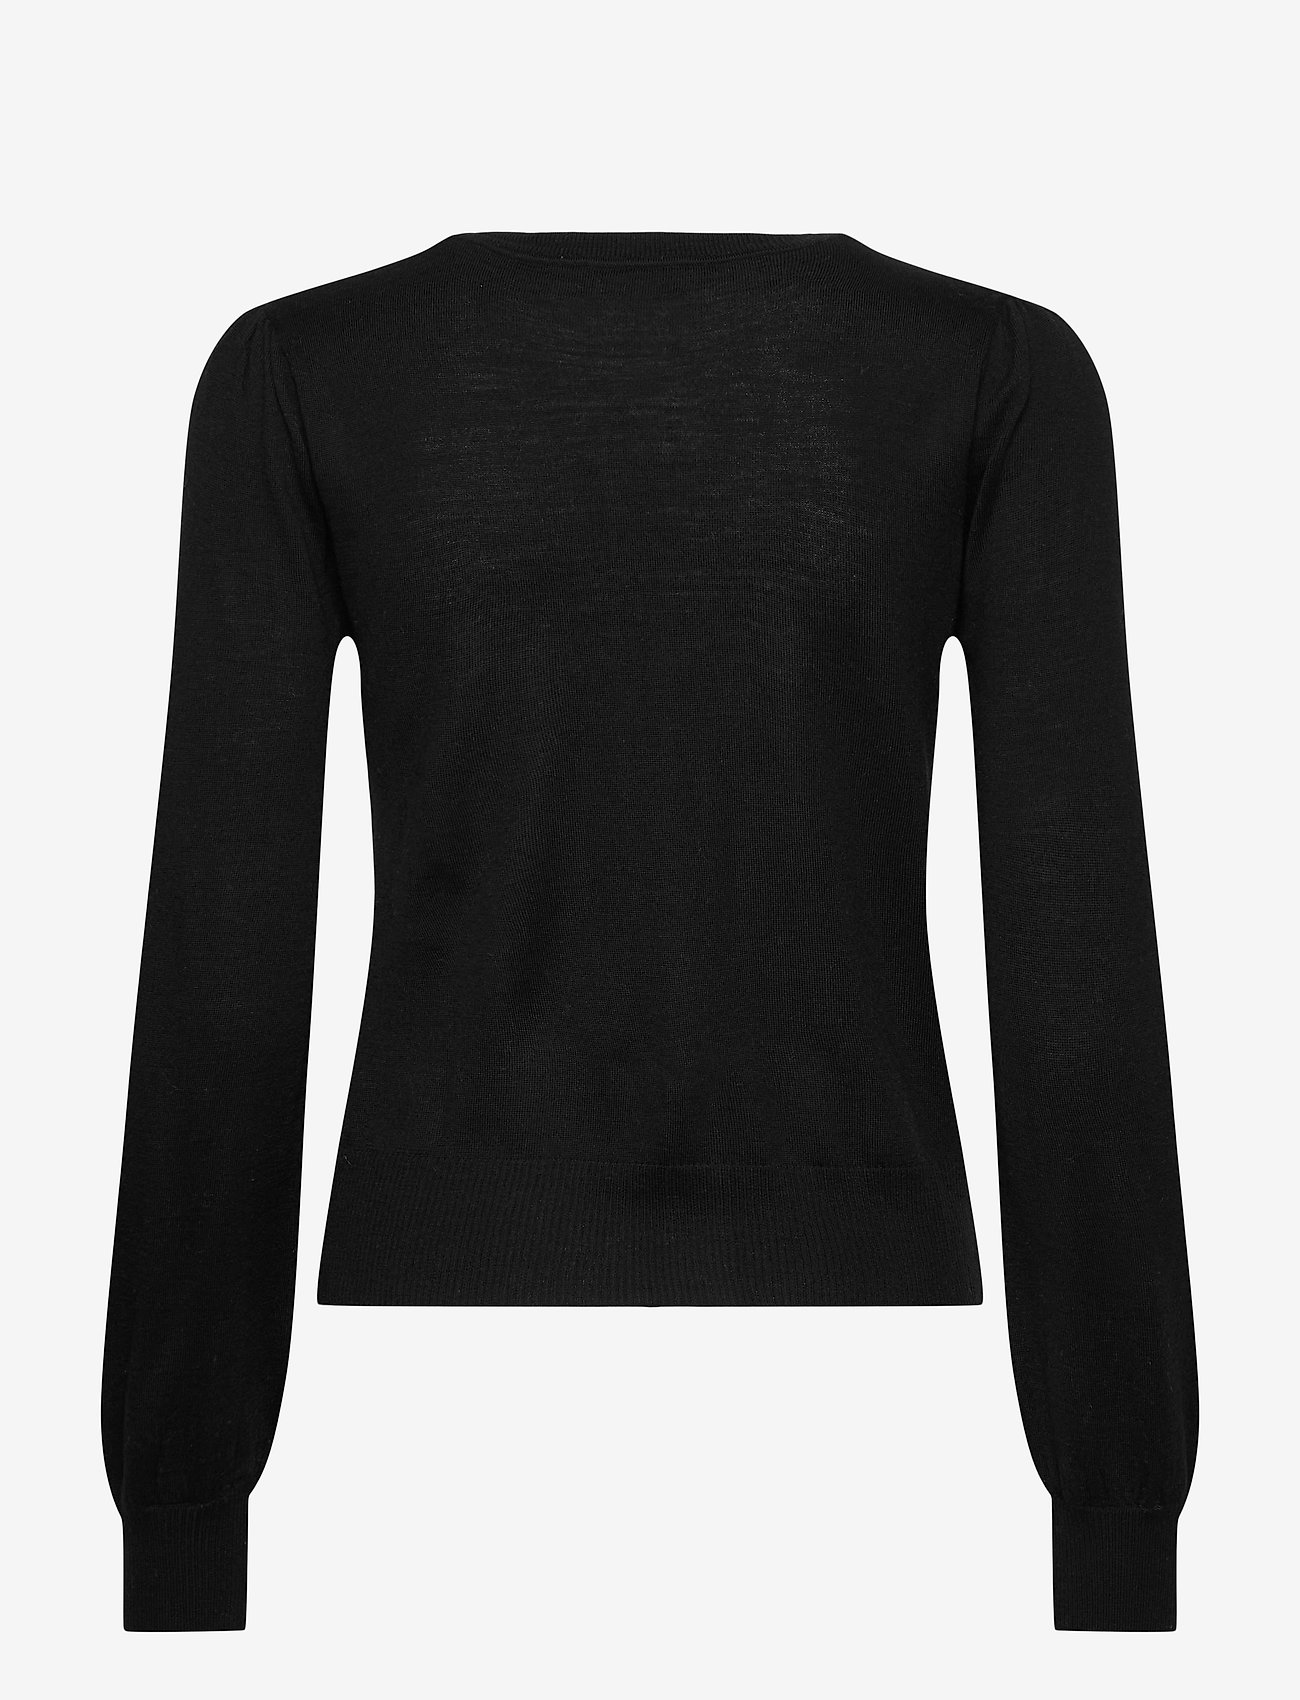 SAND - Fellini - Isamu - cardigans - black - 1